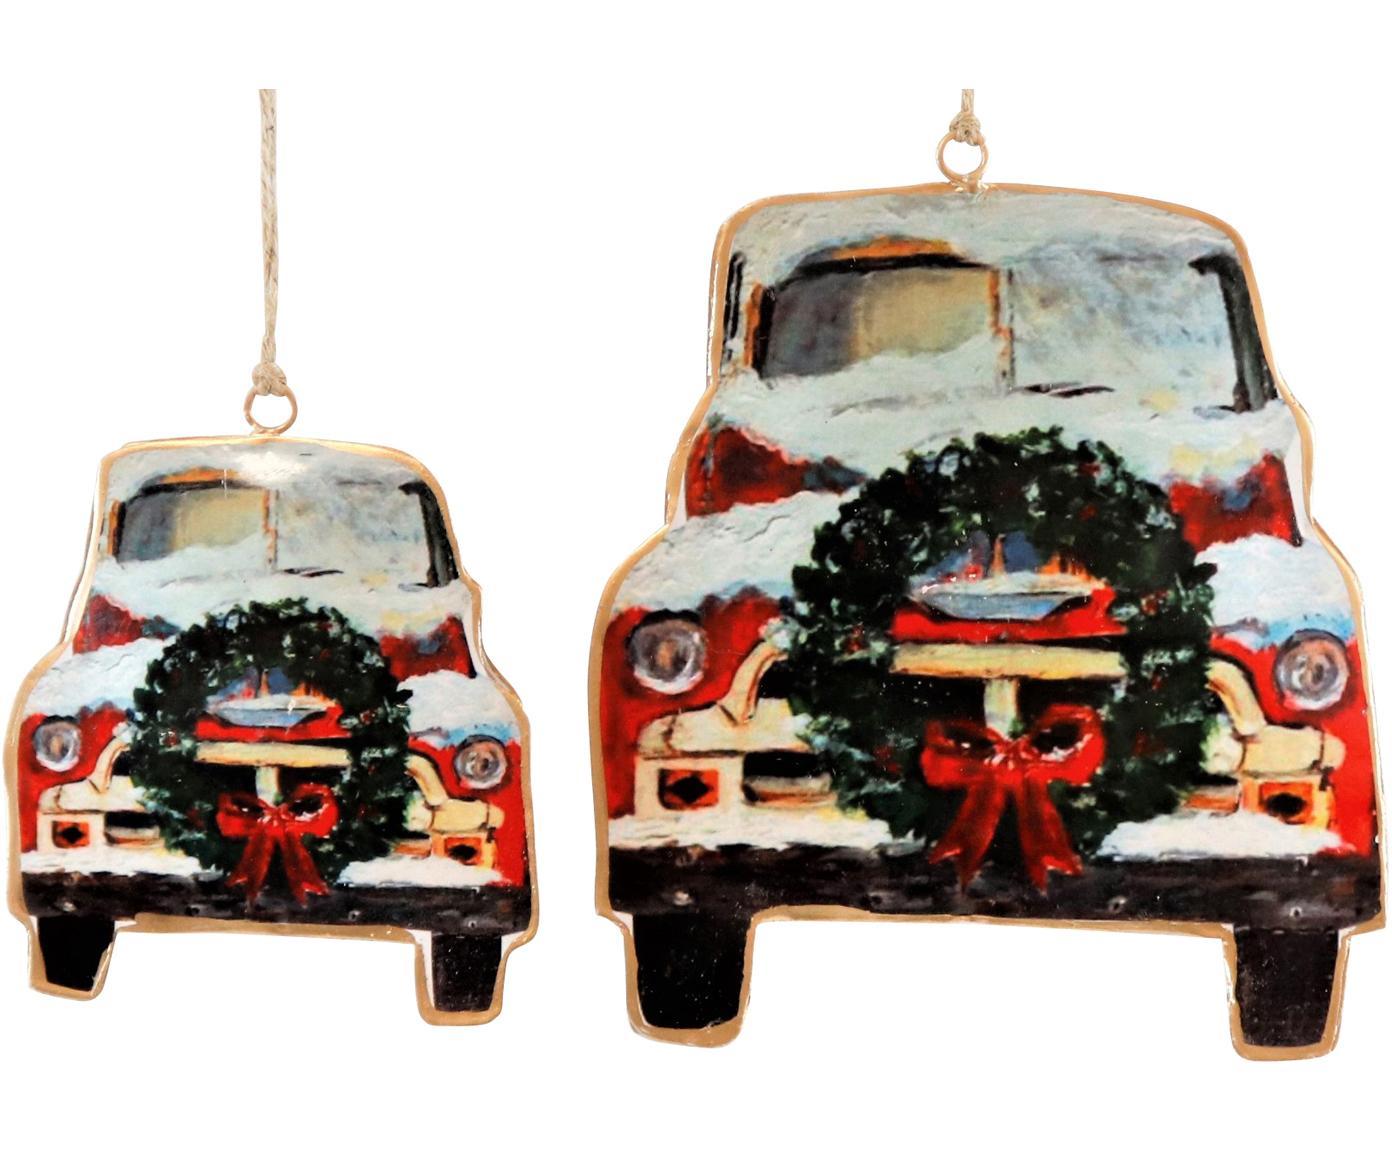 Set 2 ciondoli Cars, Metallo, Rosso, nero, bianco, Set in varie misure